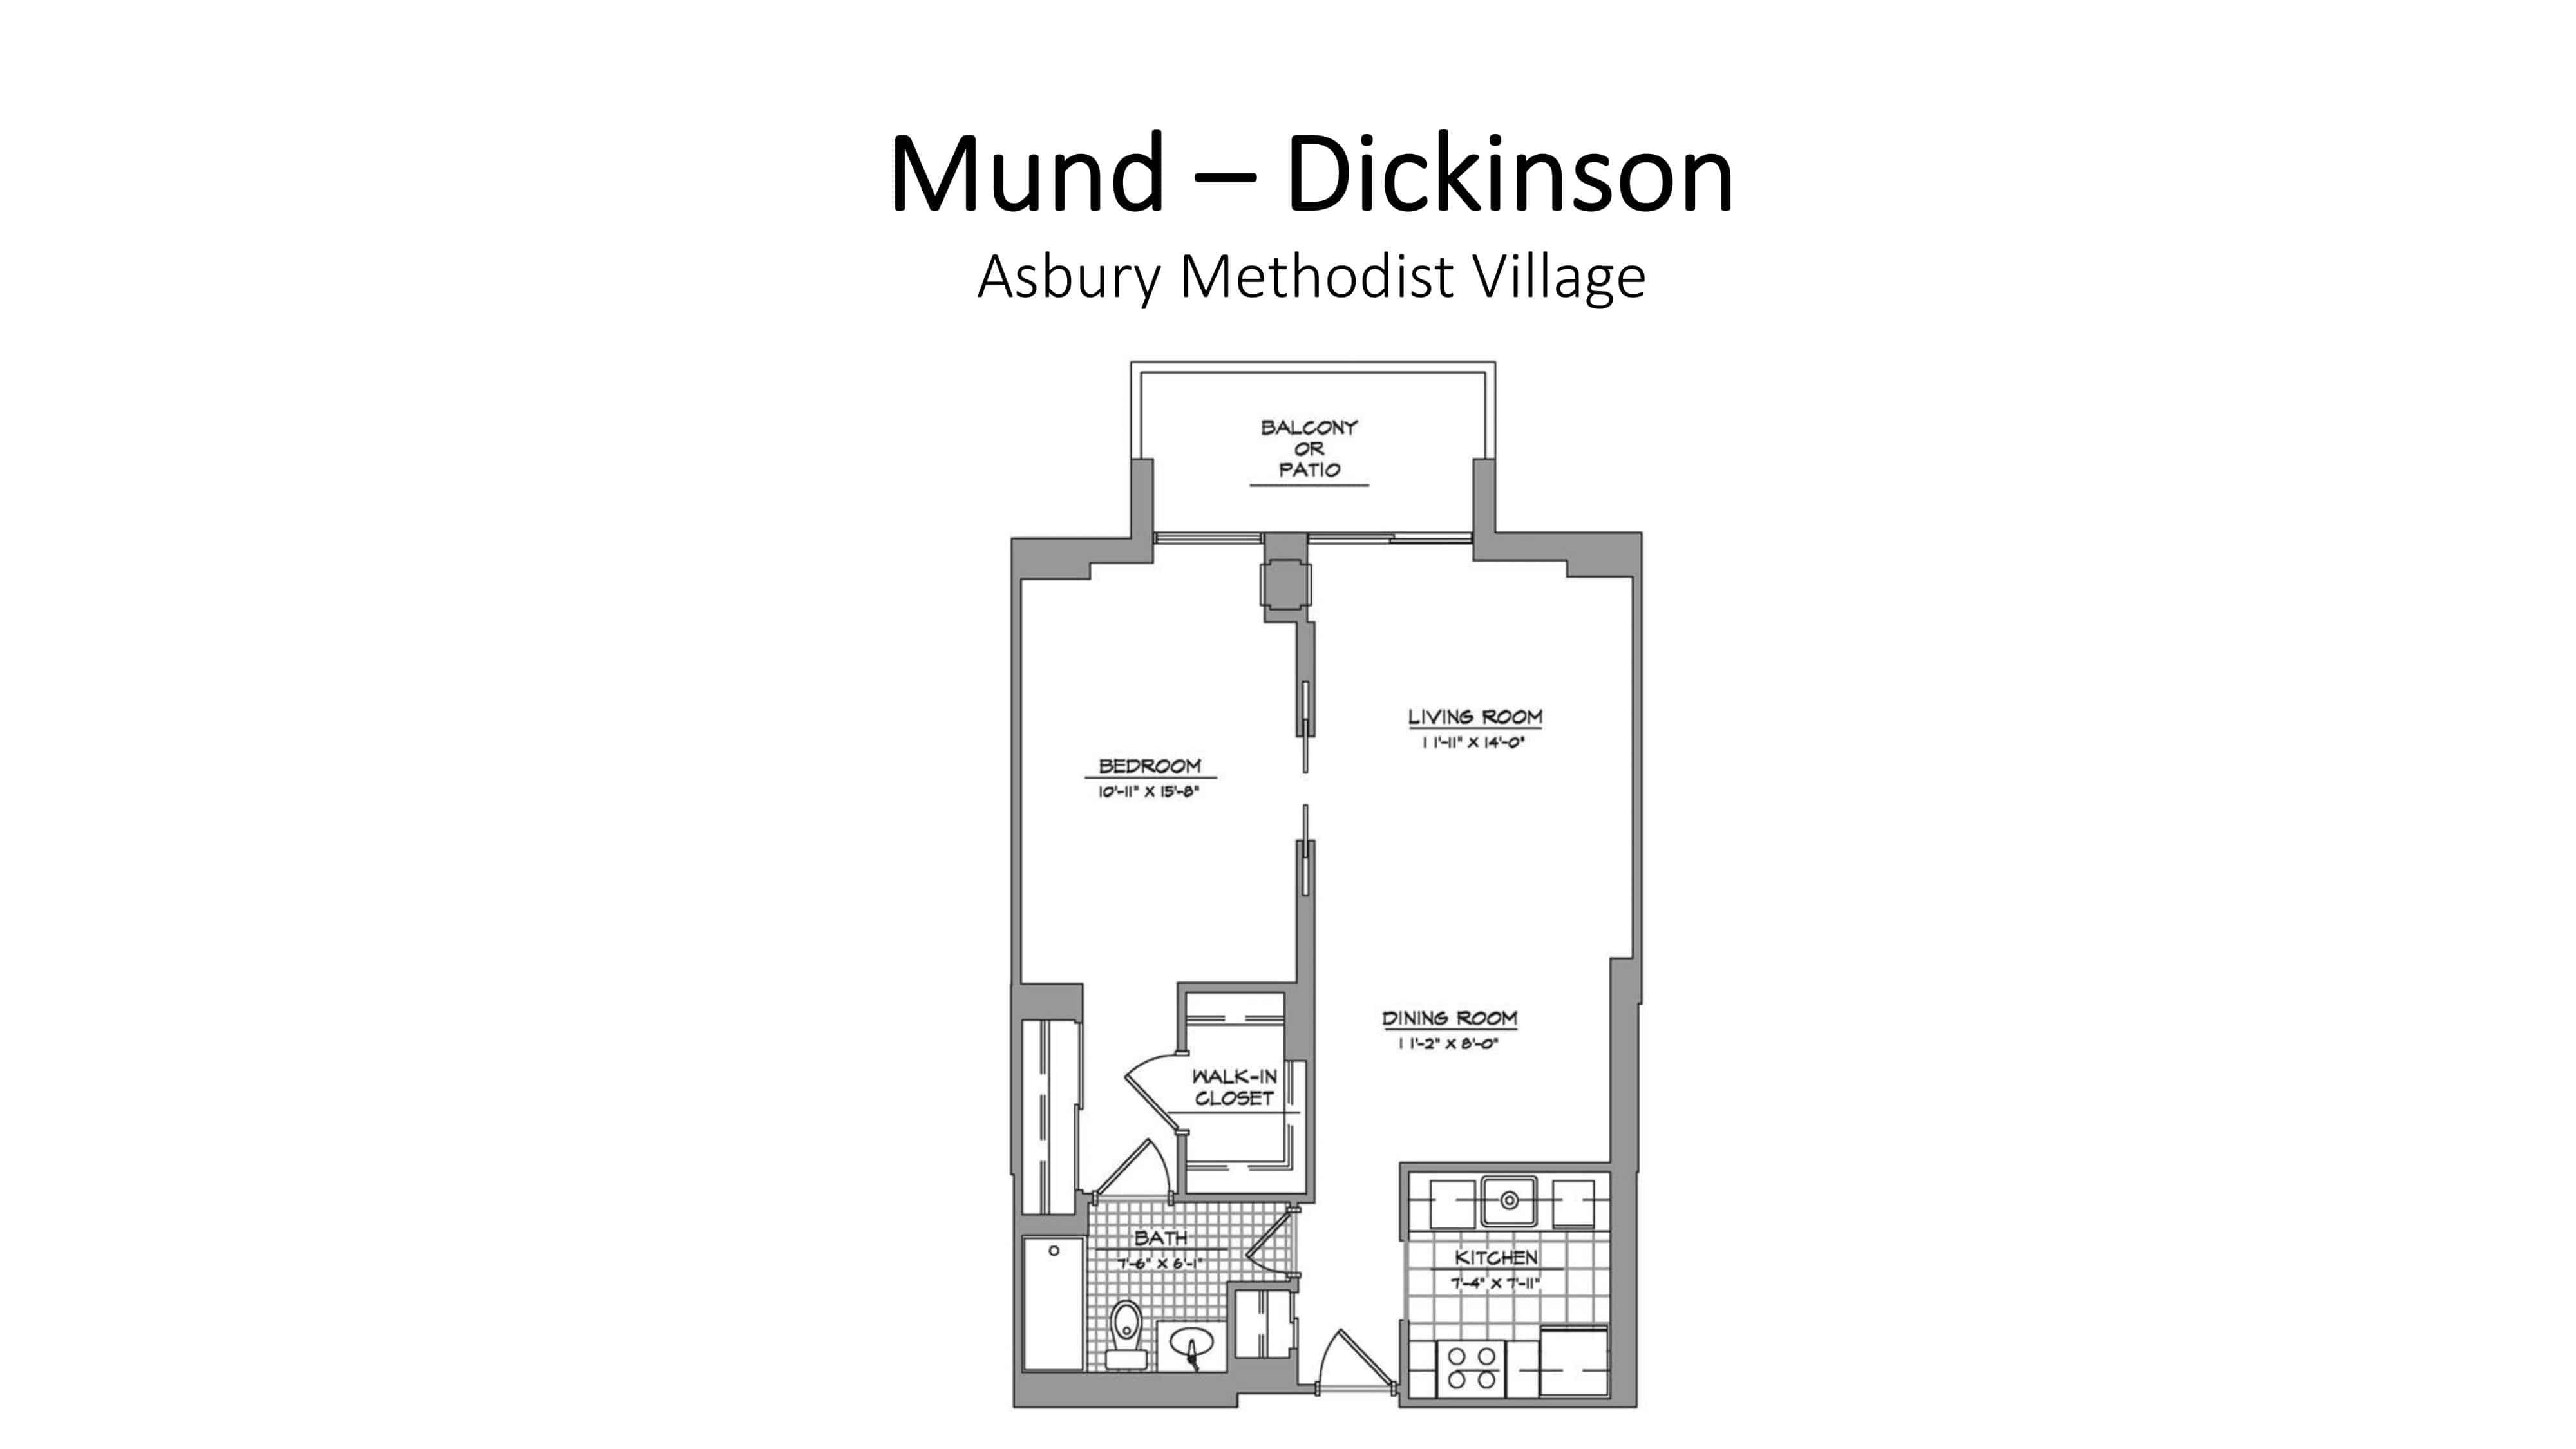 AMV Mund - Dickinson